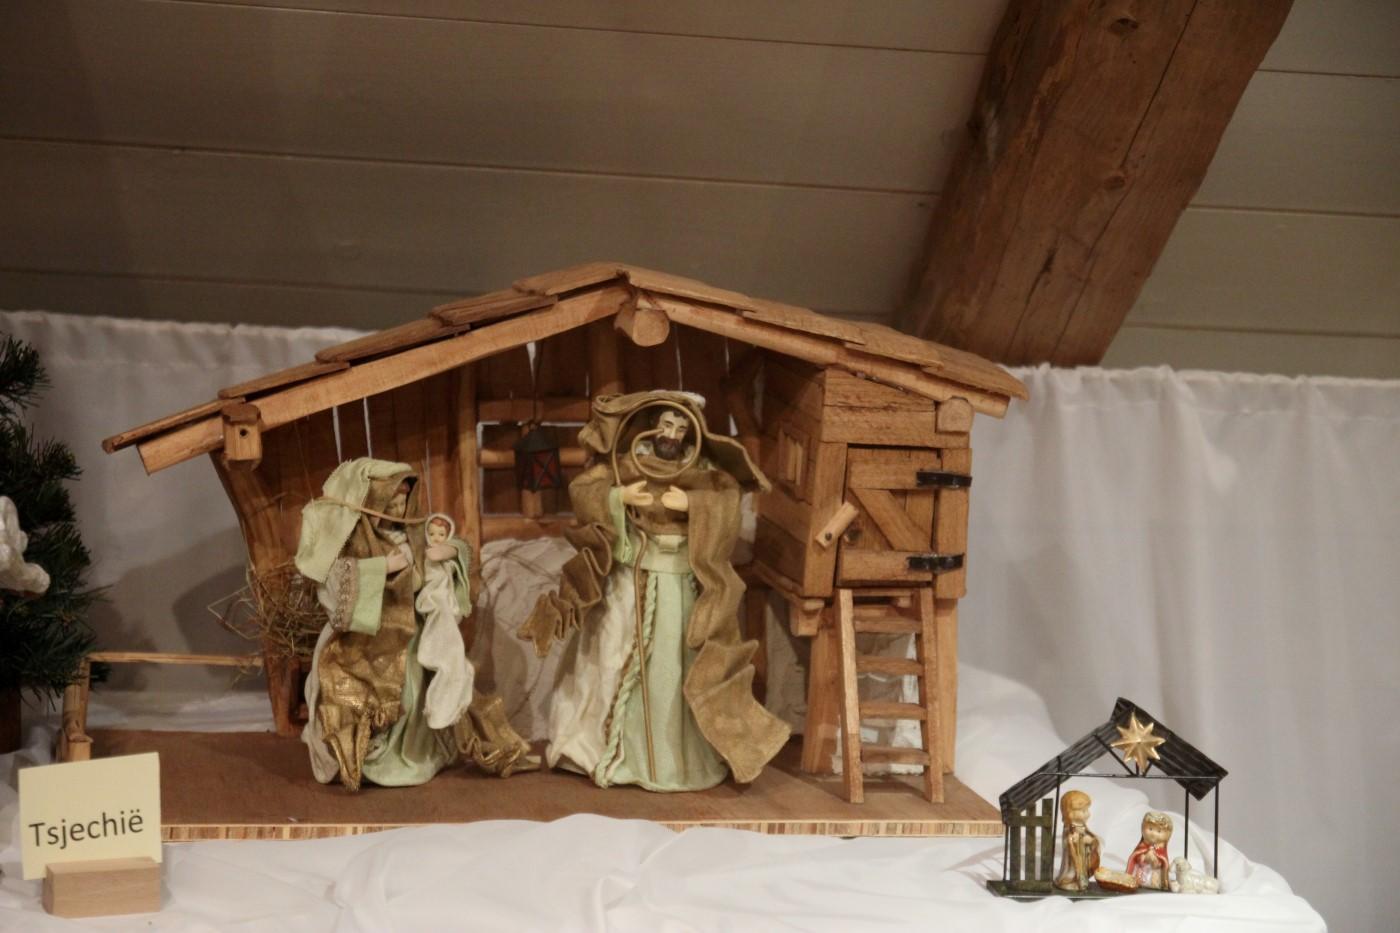 Kerstwereldwijd 3